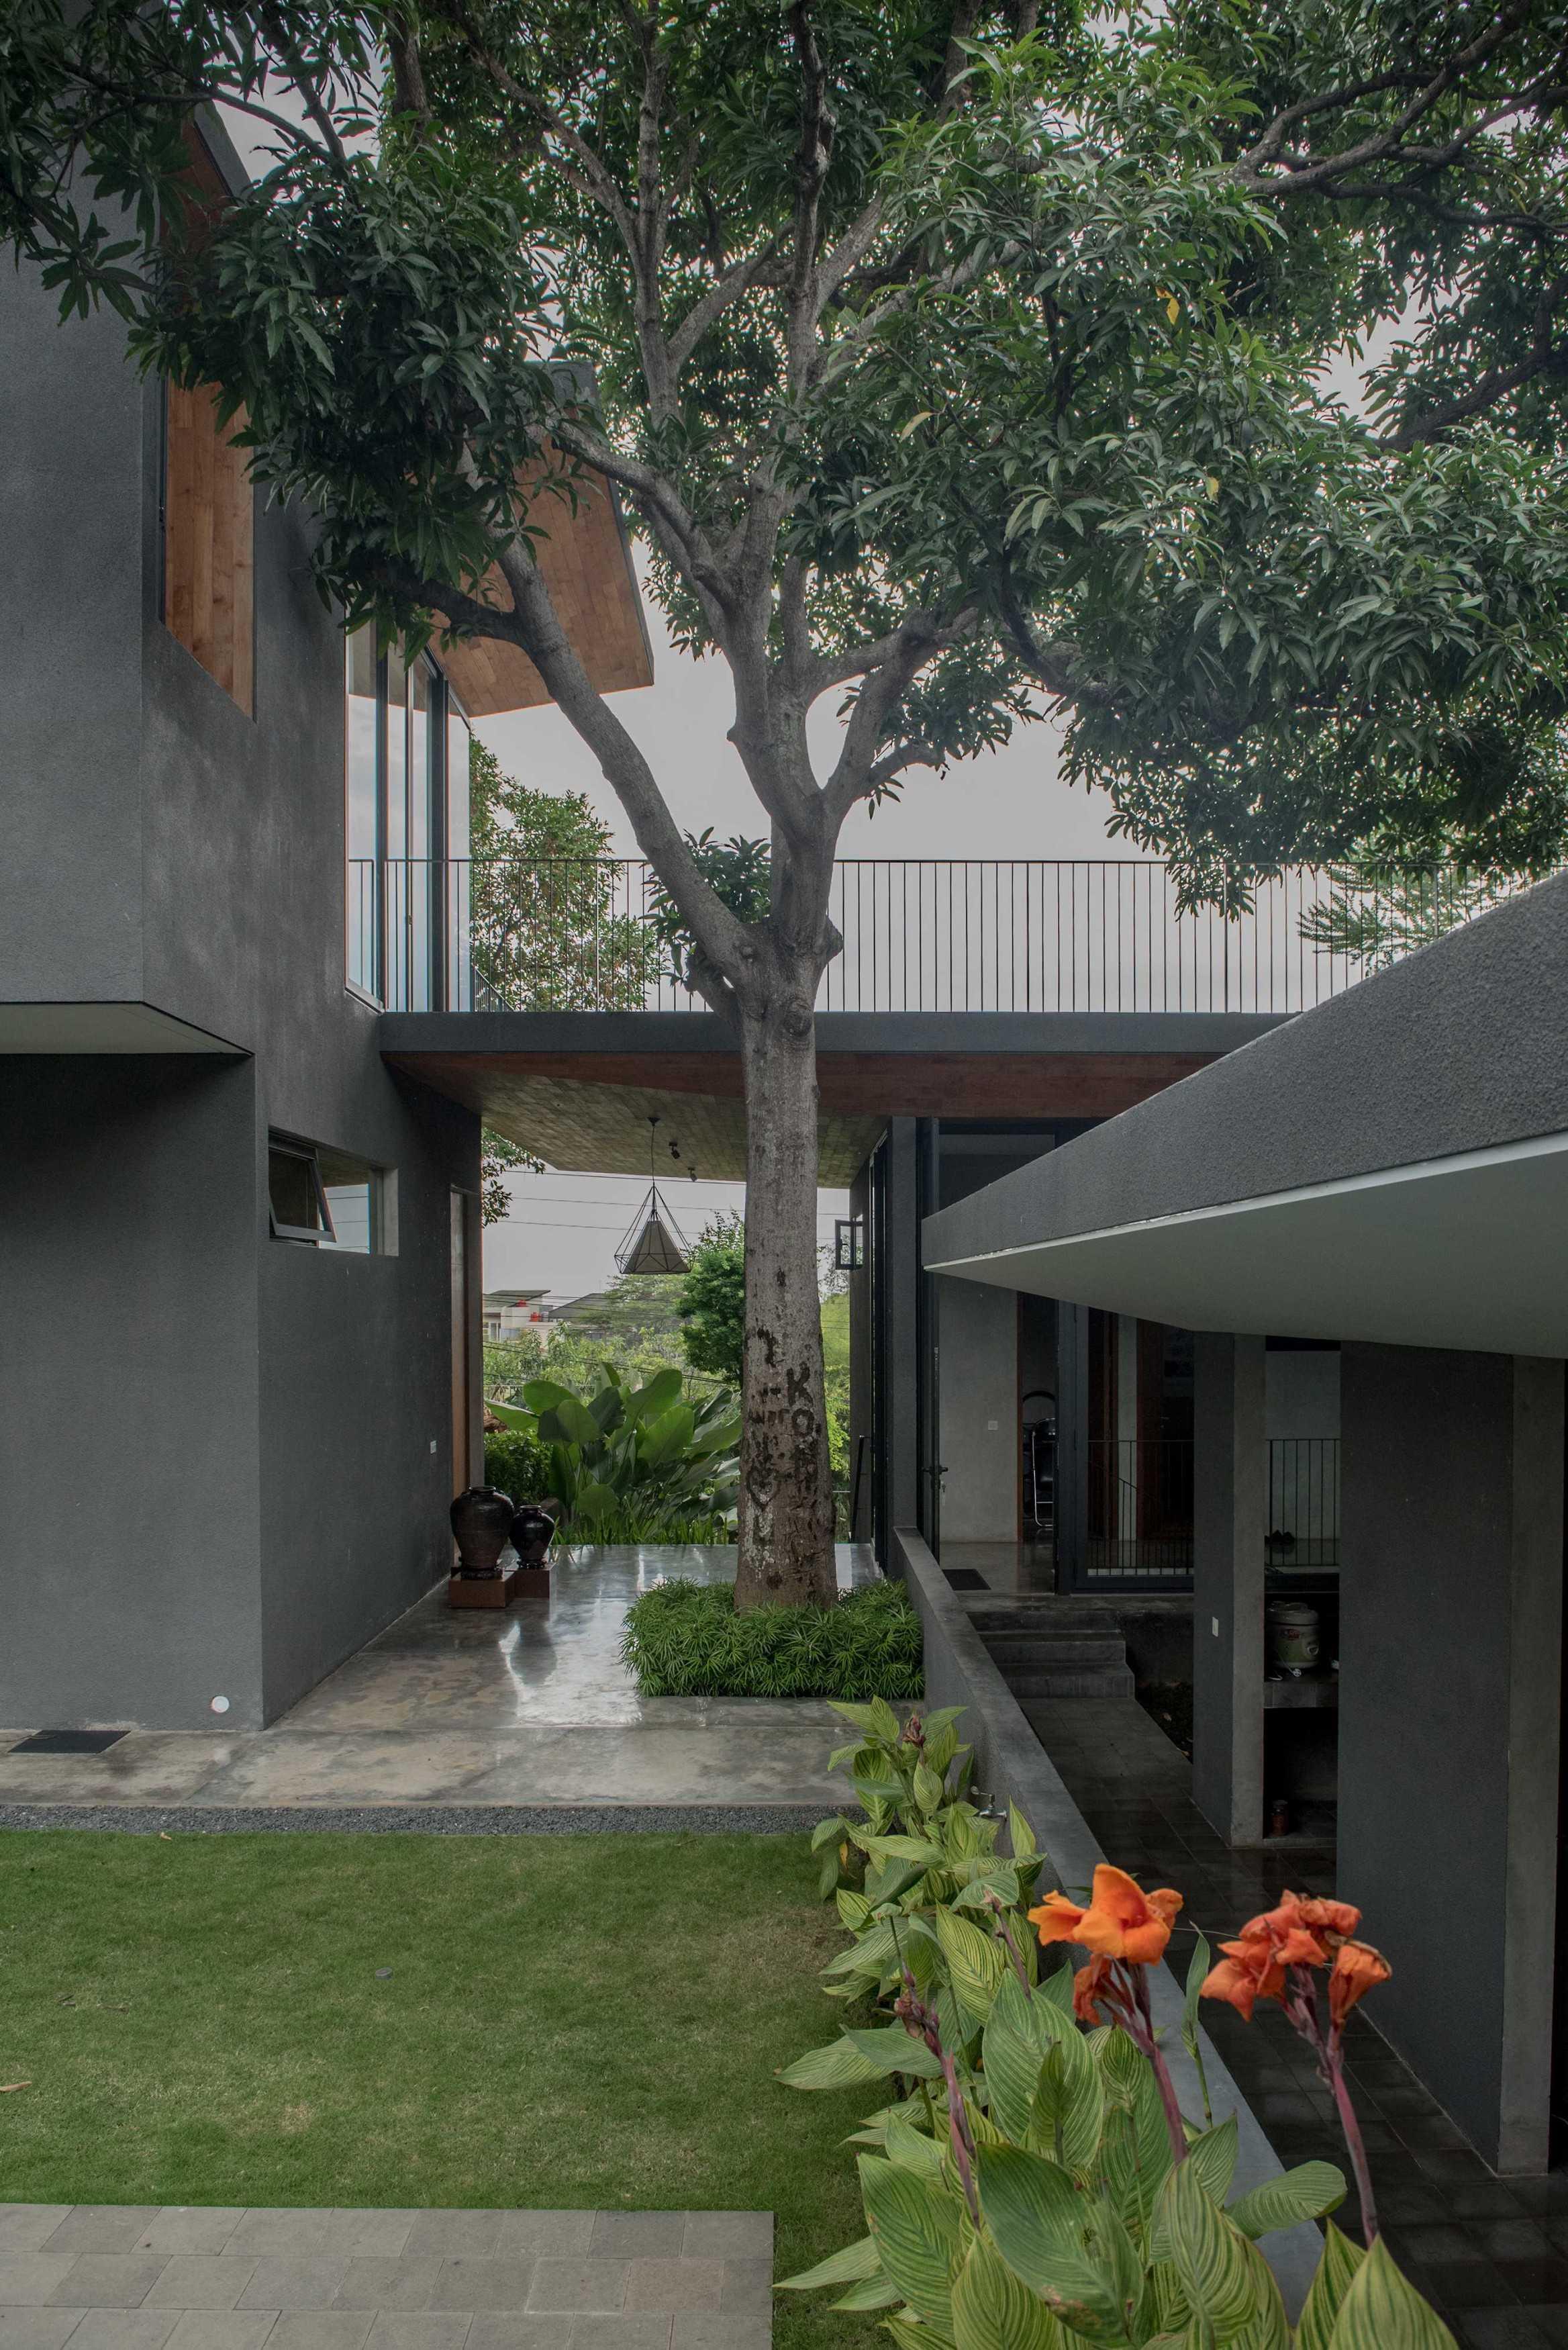 Tamara Wibowo House 1 Semarang, Semarang City, Central Java, Indonesia Semarang, Indonesia Outdoor Area   17949